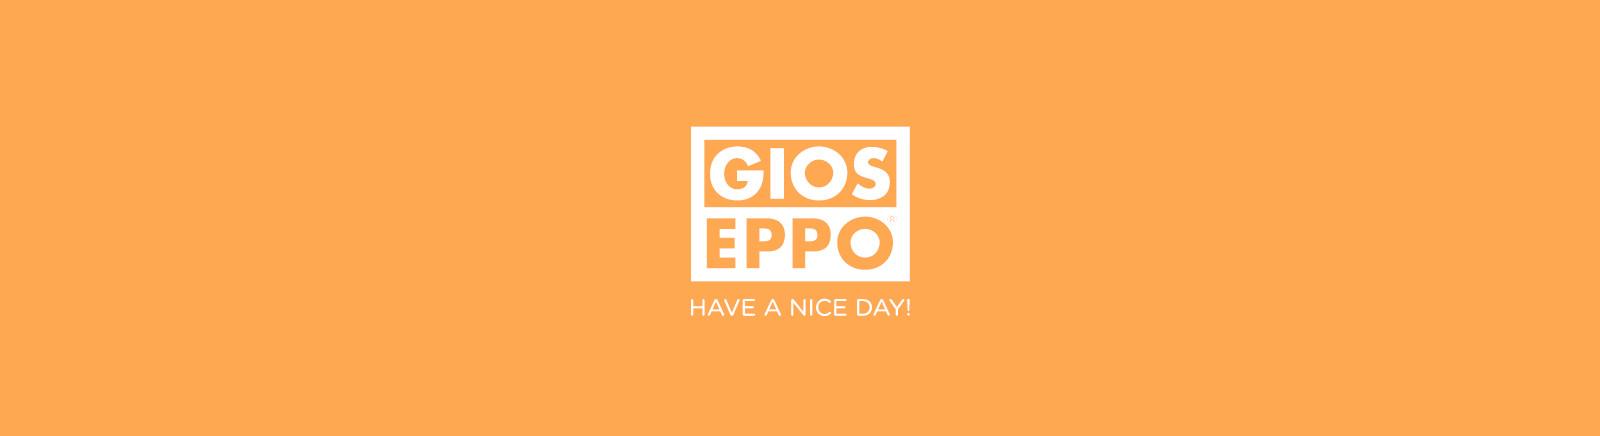 gioseppo Markenschuhe online kaufen im GISY Schuhe Shop